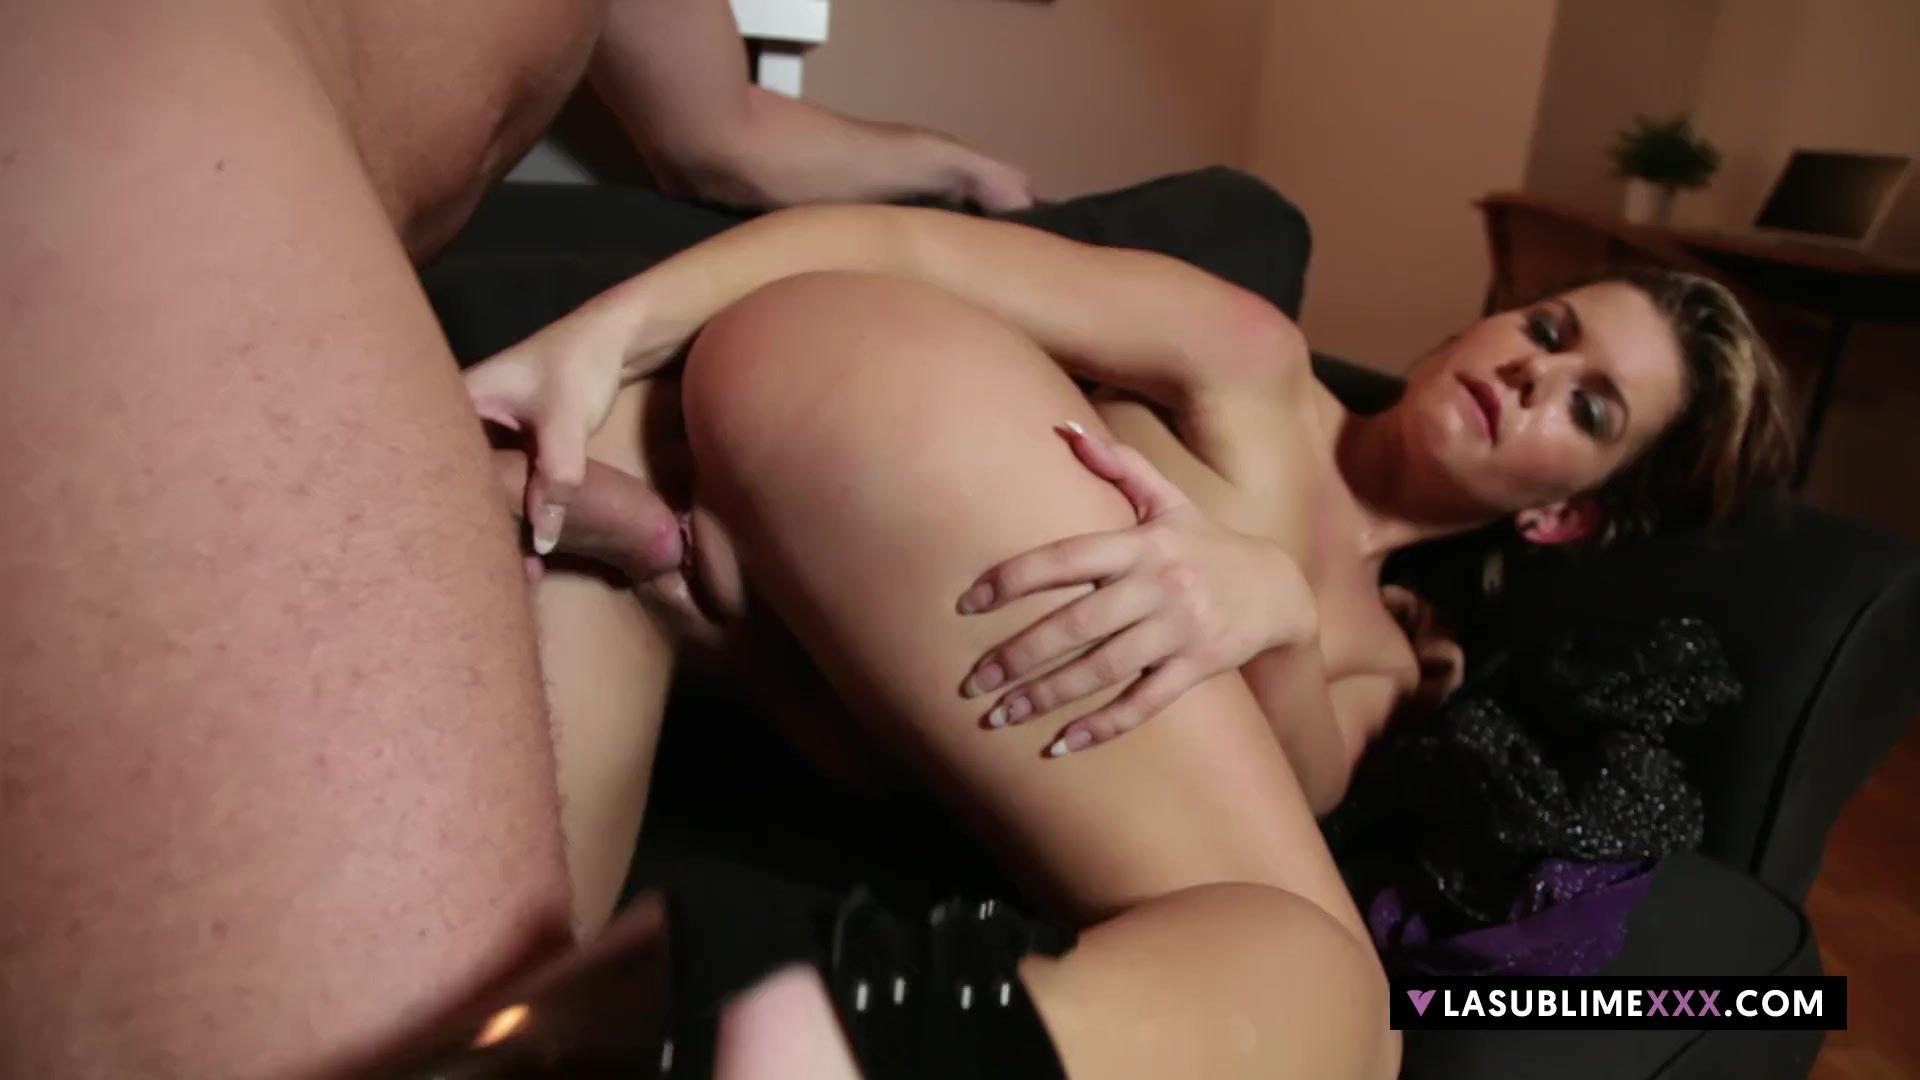 Actrid Porno Linette Thierno lasublimexxx rihanna samuel needs her boyfriend big cock